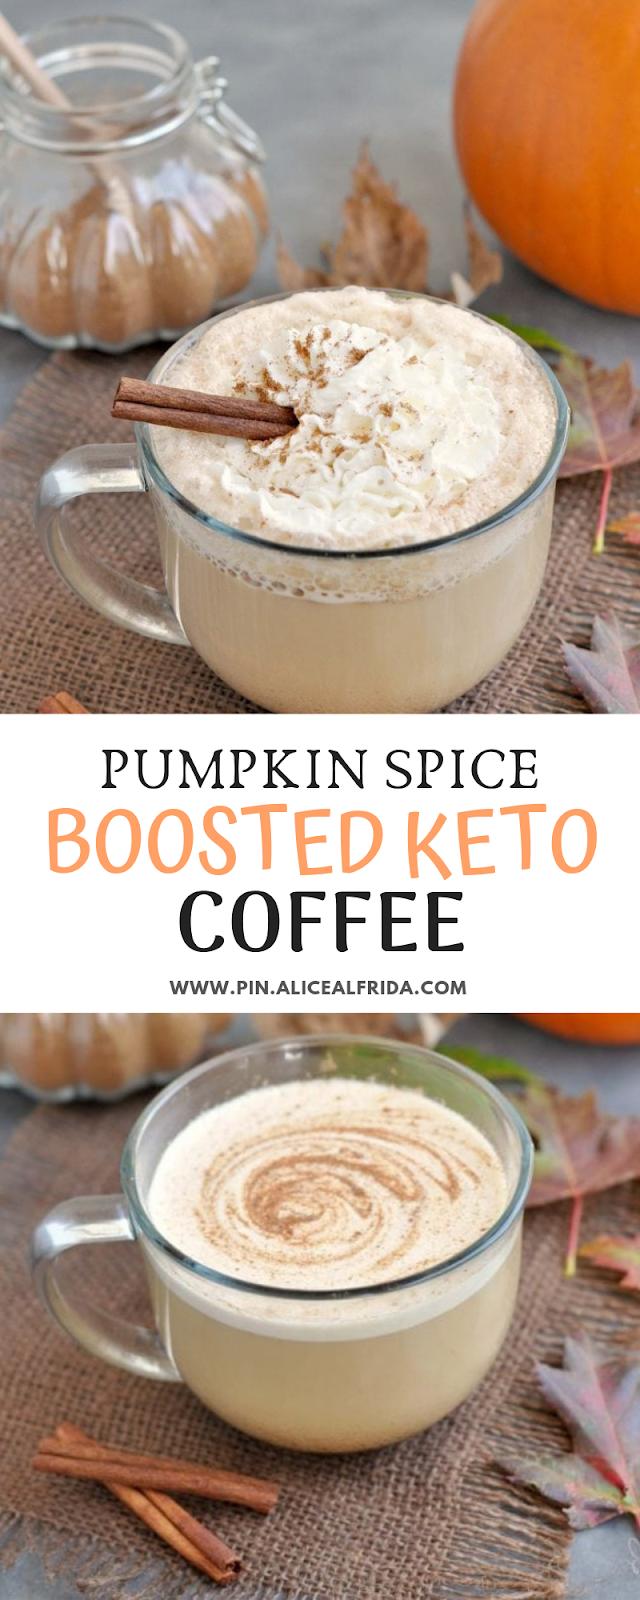 Pumpkin Spice Boosted Keto Coffee #pumpkinspiceketocoffee Pumpkin Spice Boosted Keto Coffee - PIN ALICE ALFRIDA #pumpkinspiceketocoffee